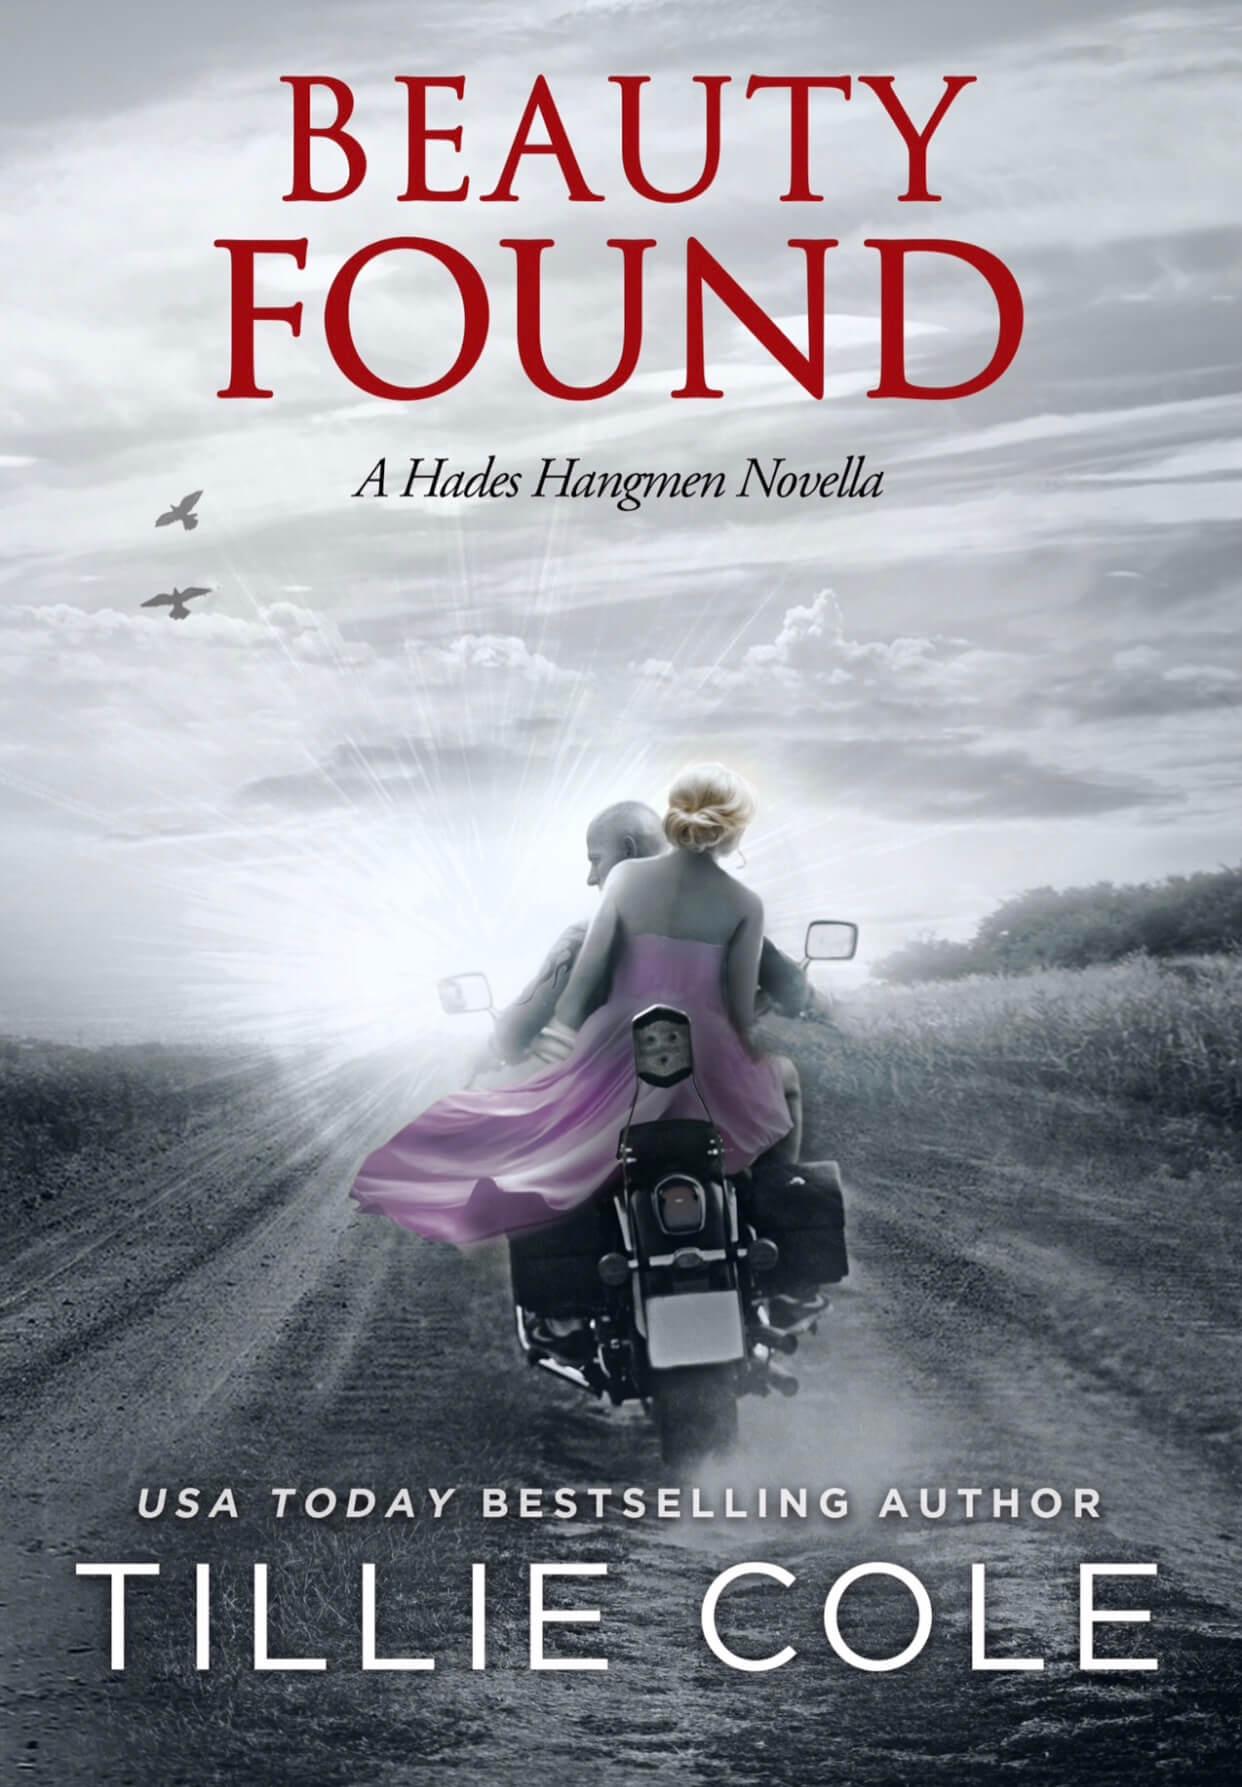 Release Blitz * Beauty Found (a Hades Hangmen novella) by Tillie Coke * 5 Star Book Review *